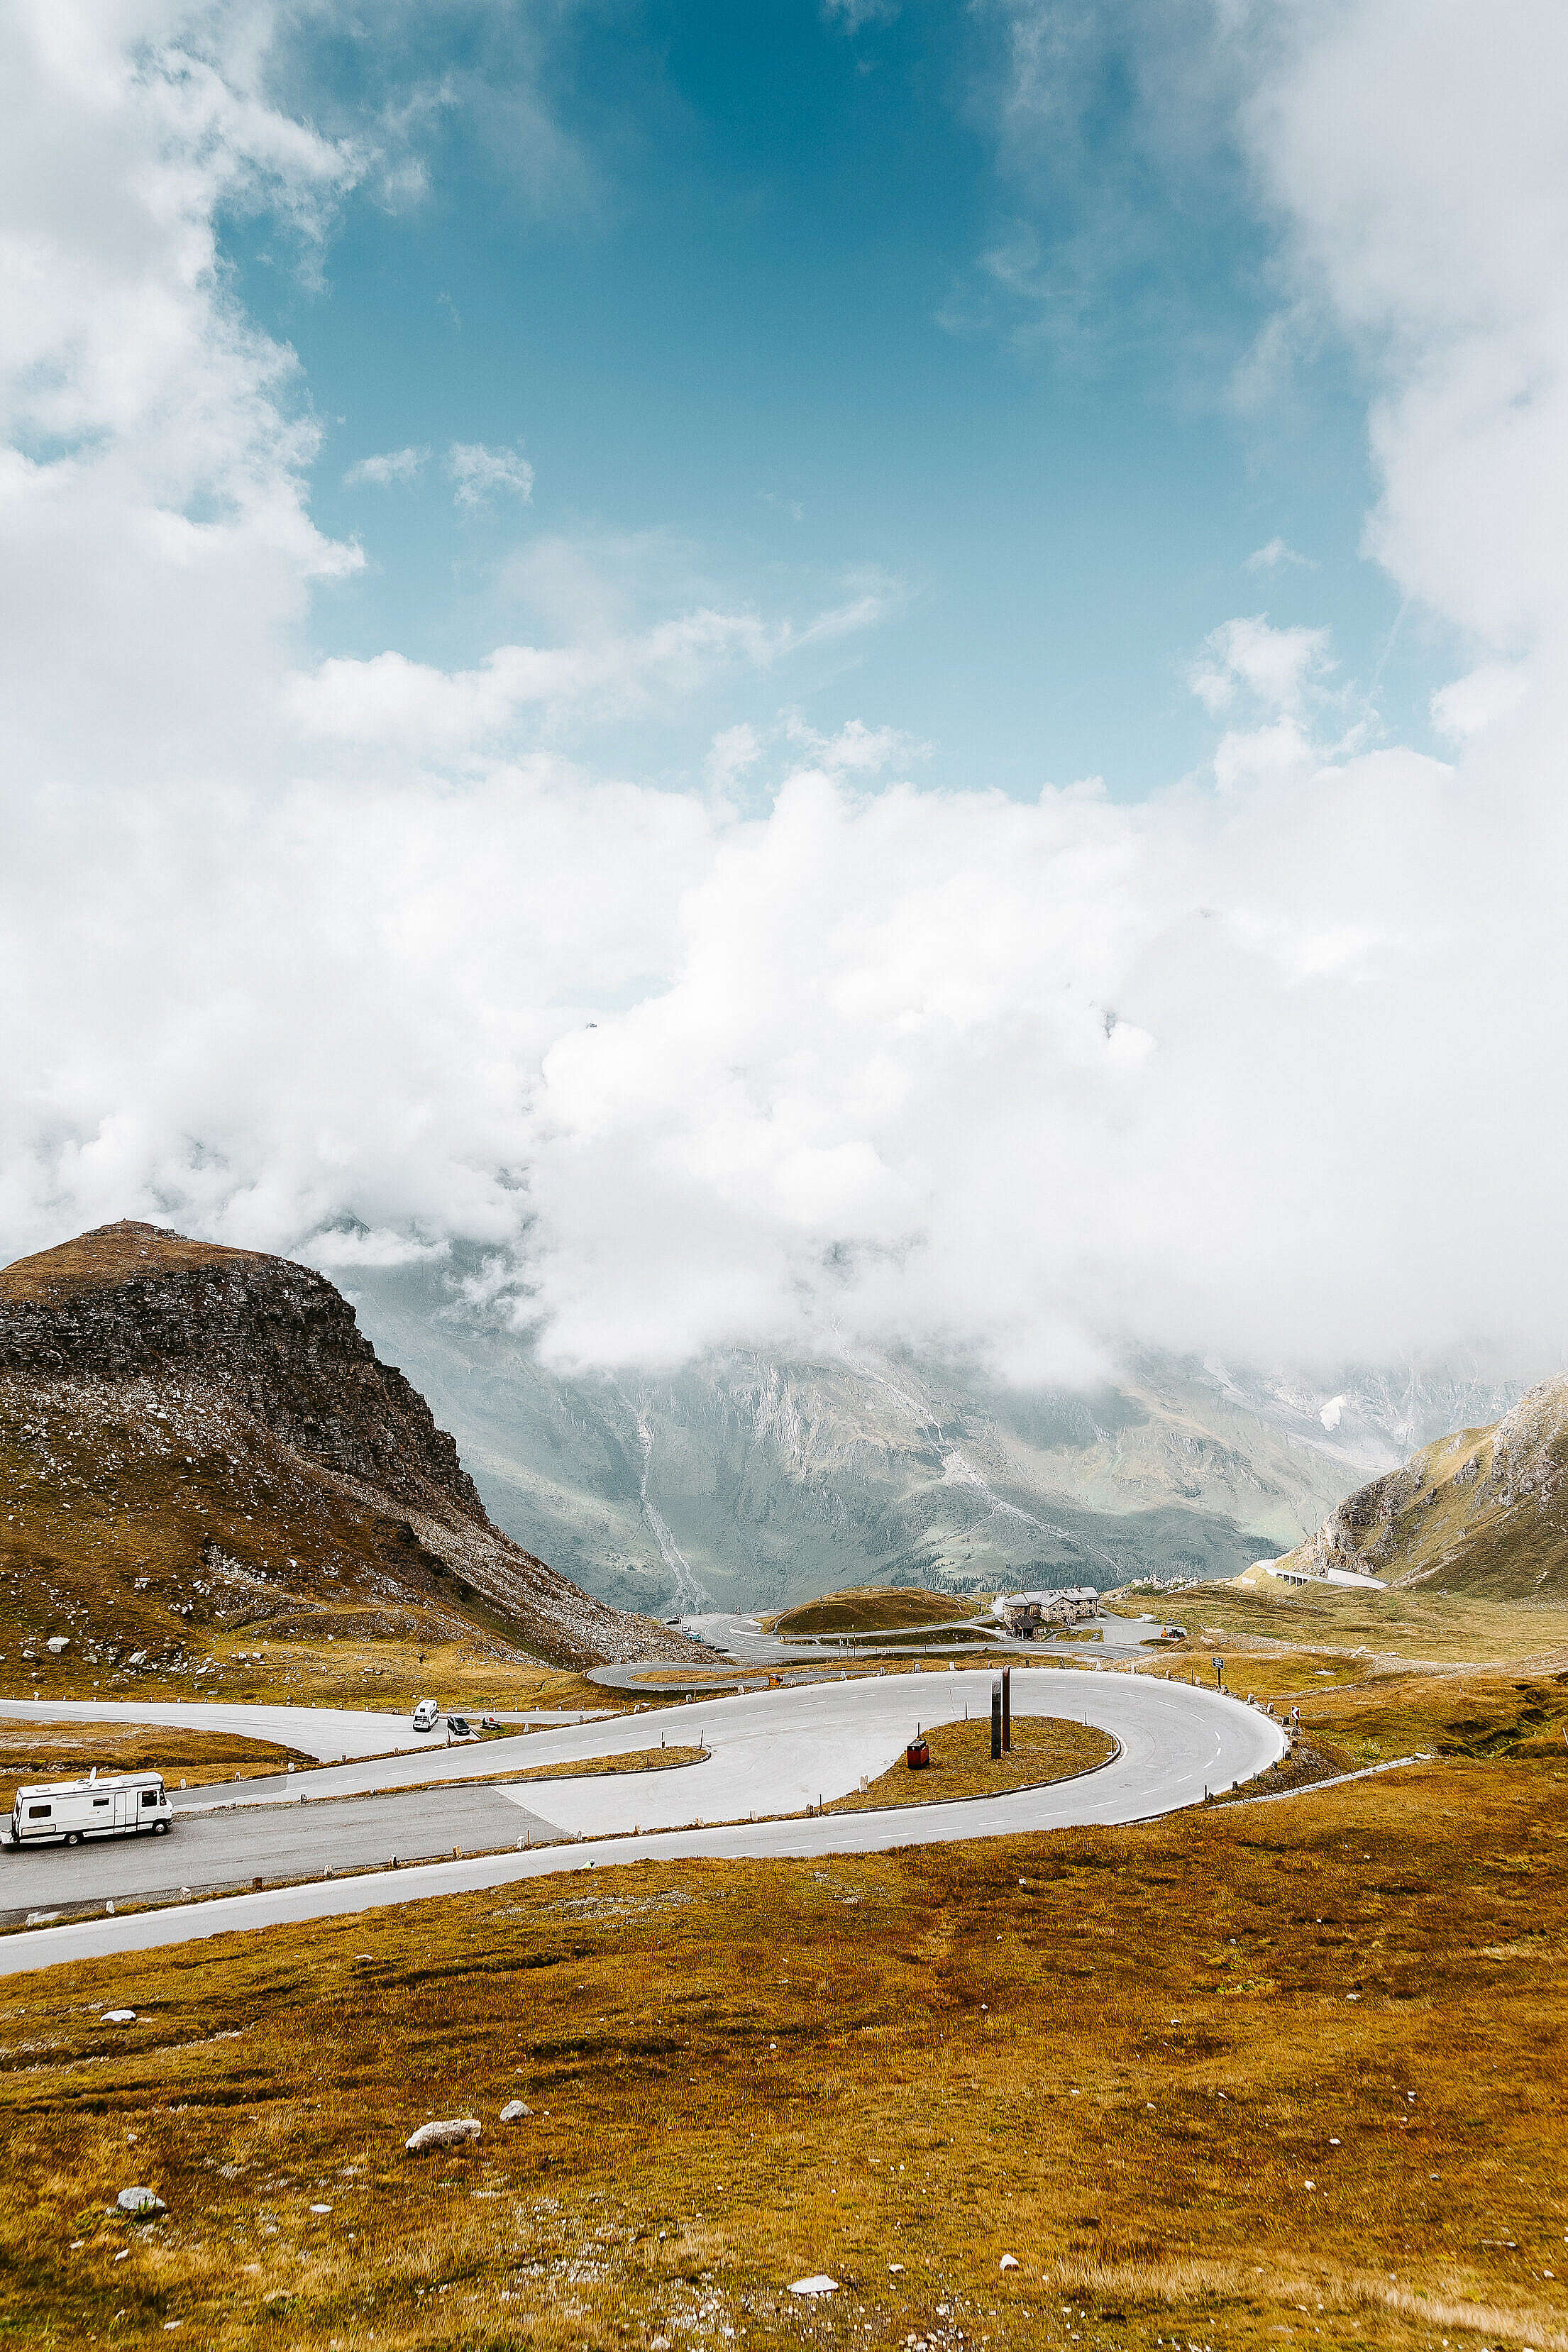 ZigZag Turns on Grossglockner High Alpine Road, Austria Free Stock Photo